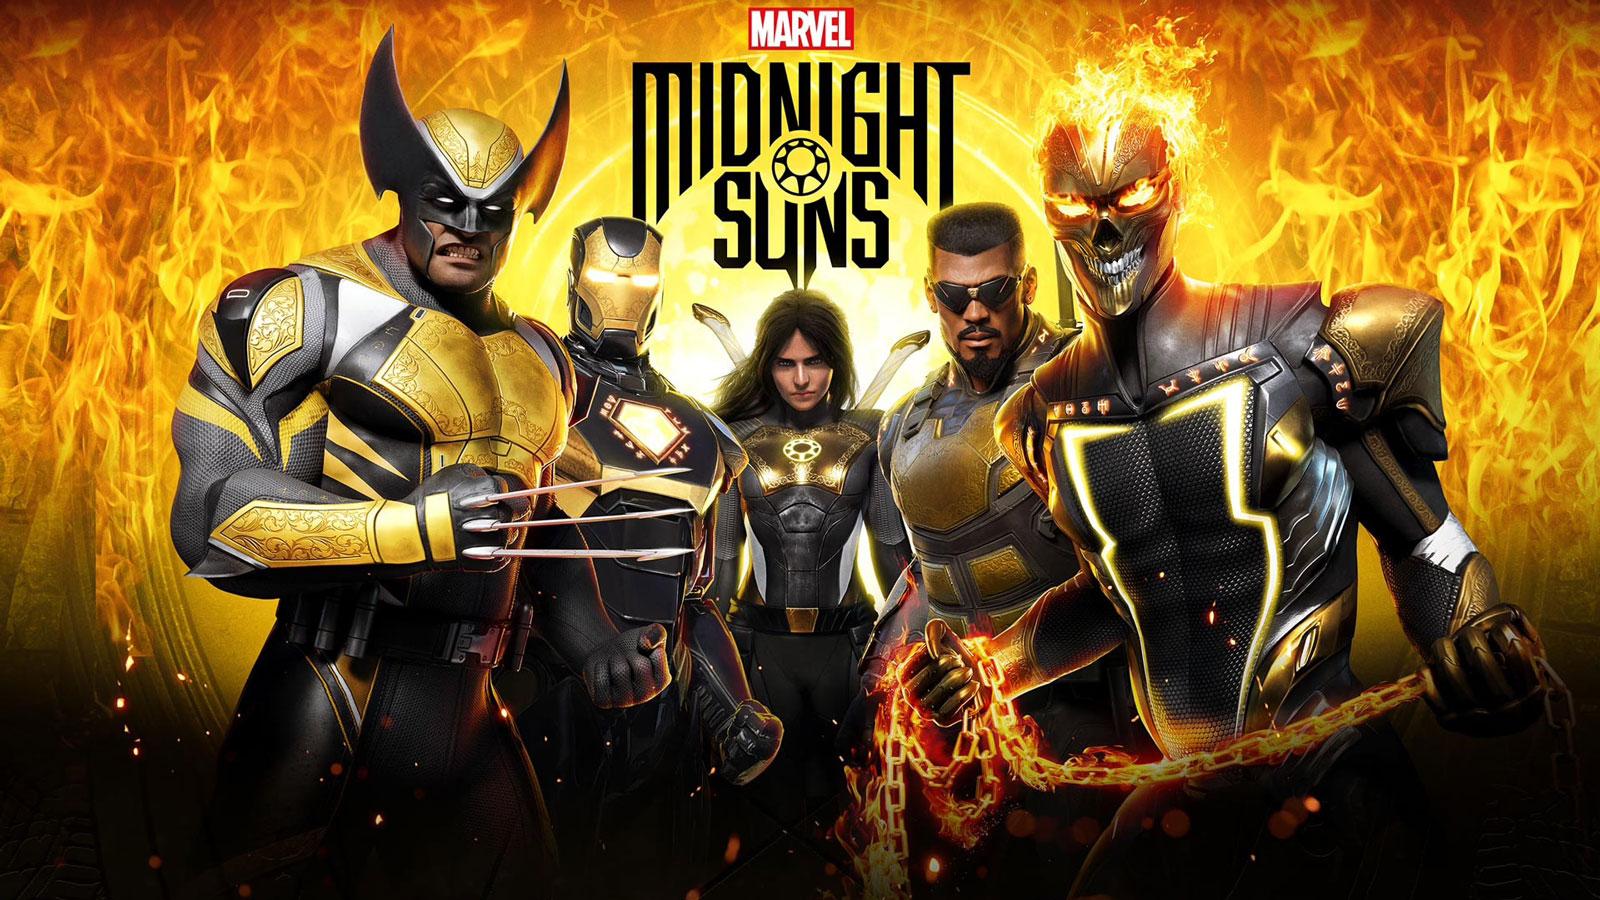 Free Marvel's Midnight Suns Wallpaper in 1600x900